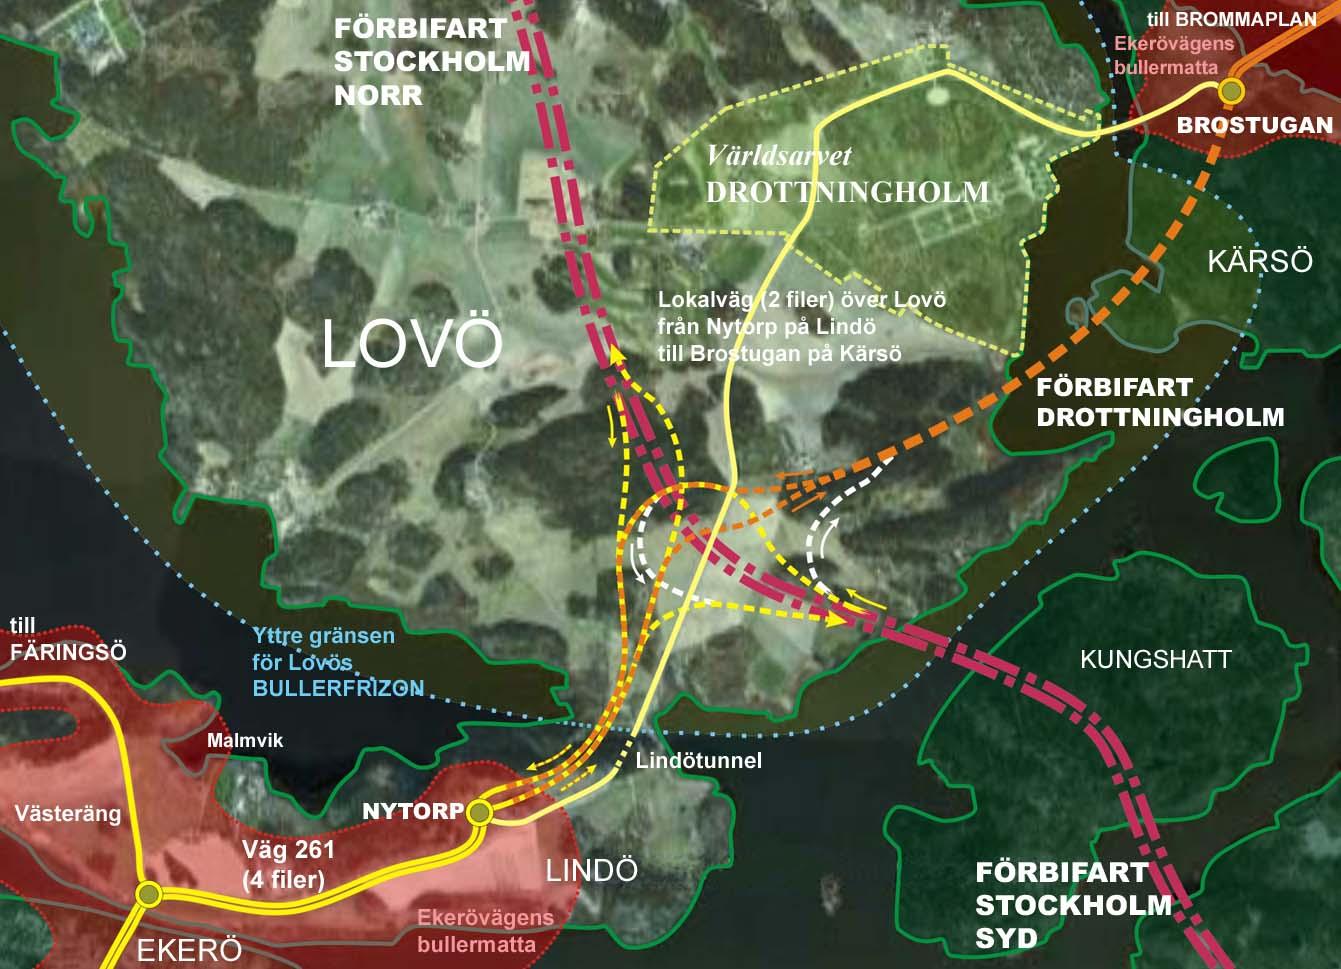 Förbifart stockholm karta